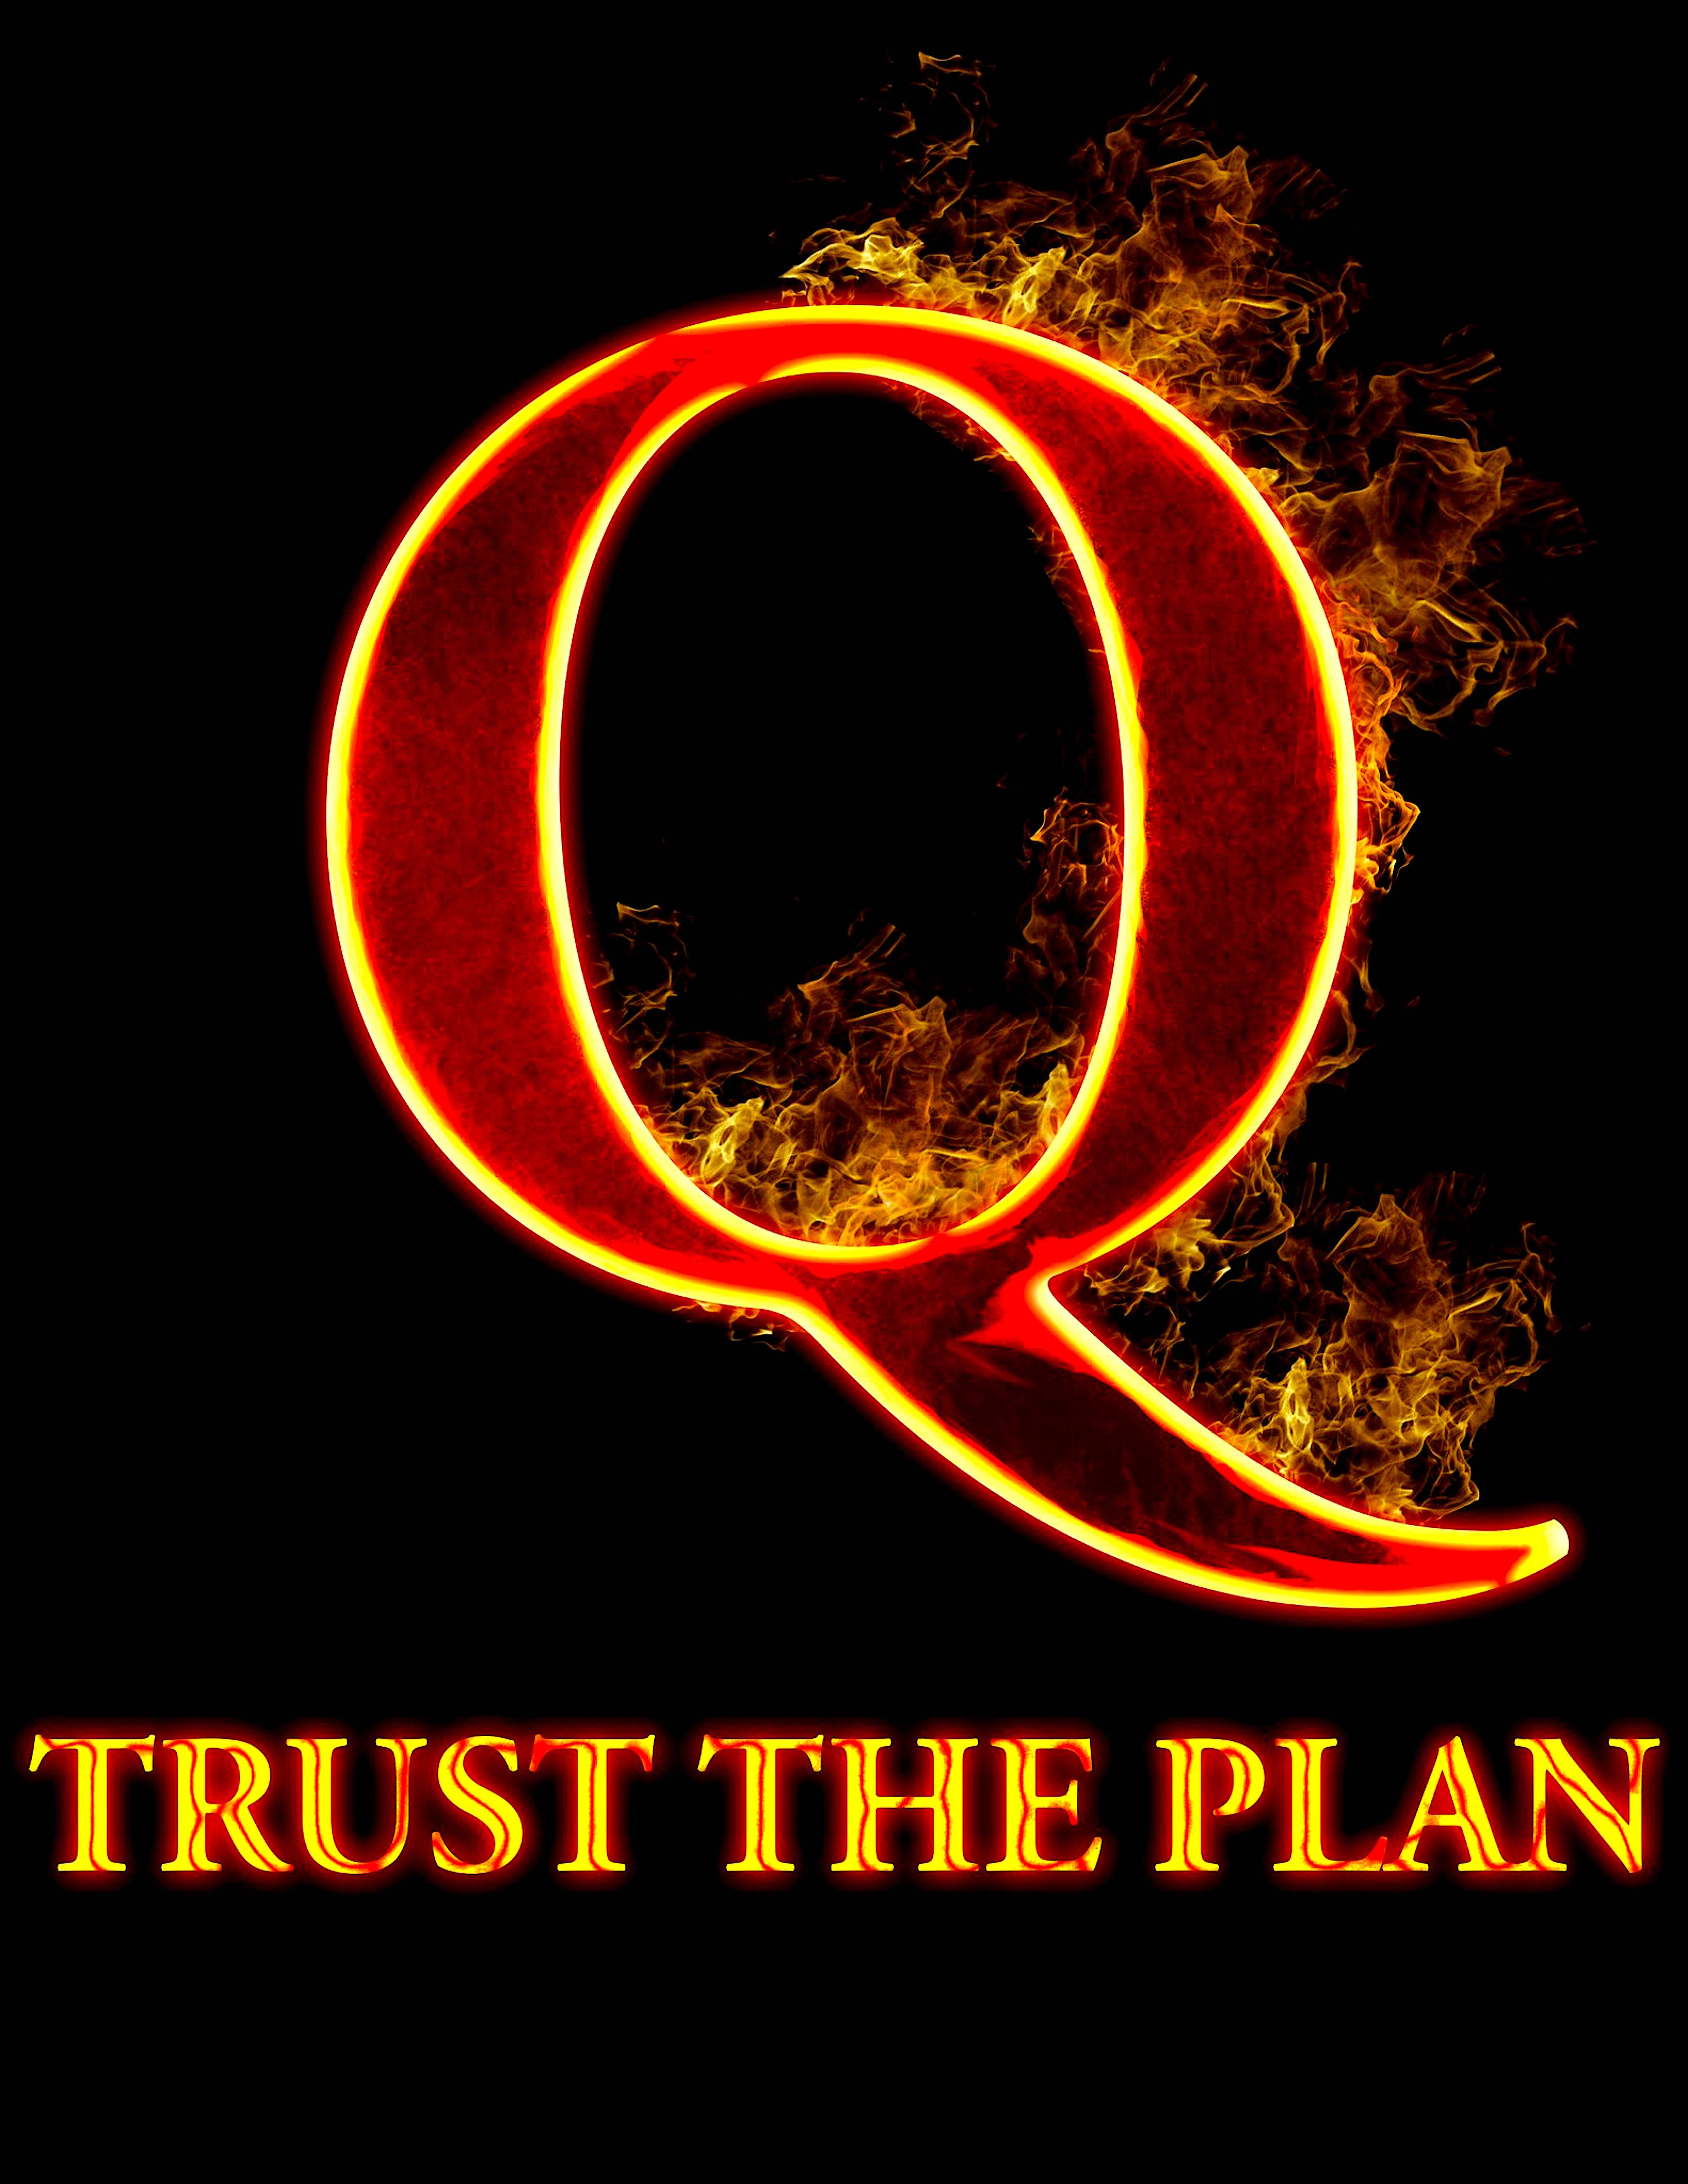 Q Trust the plan (foto Q Tee Shirts)